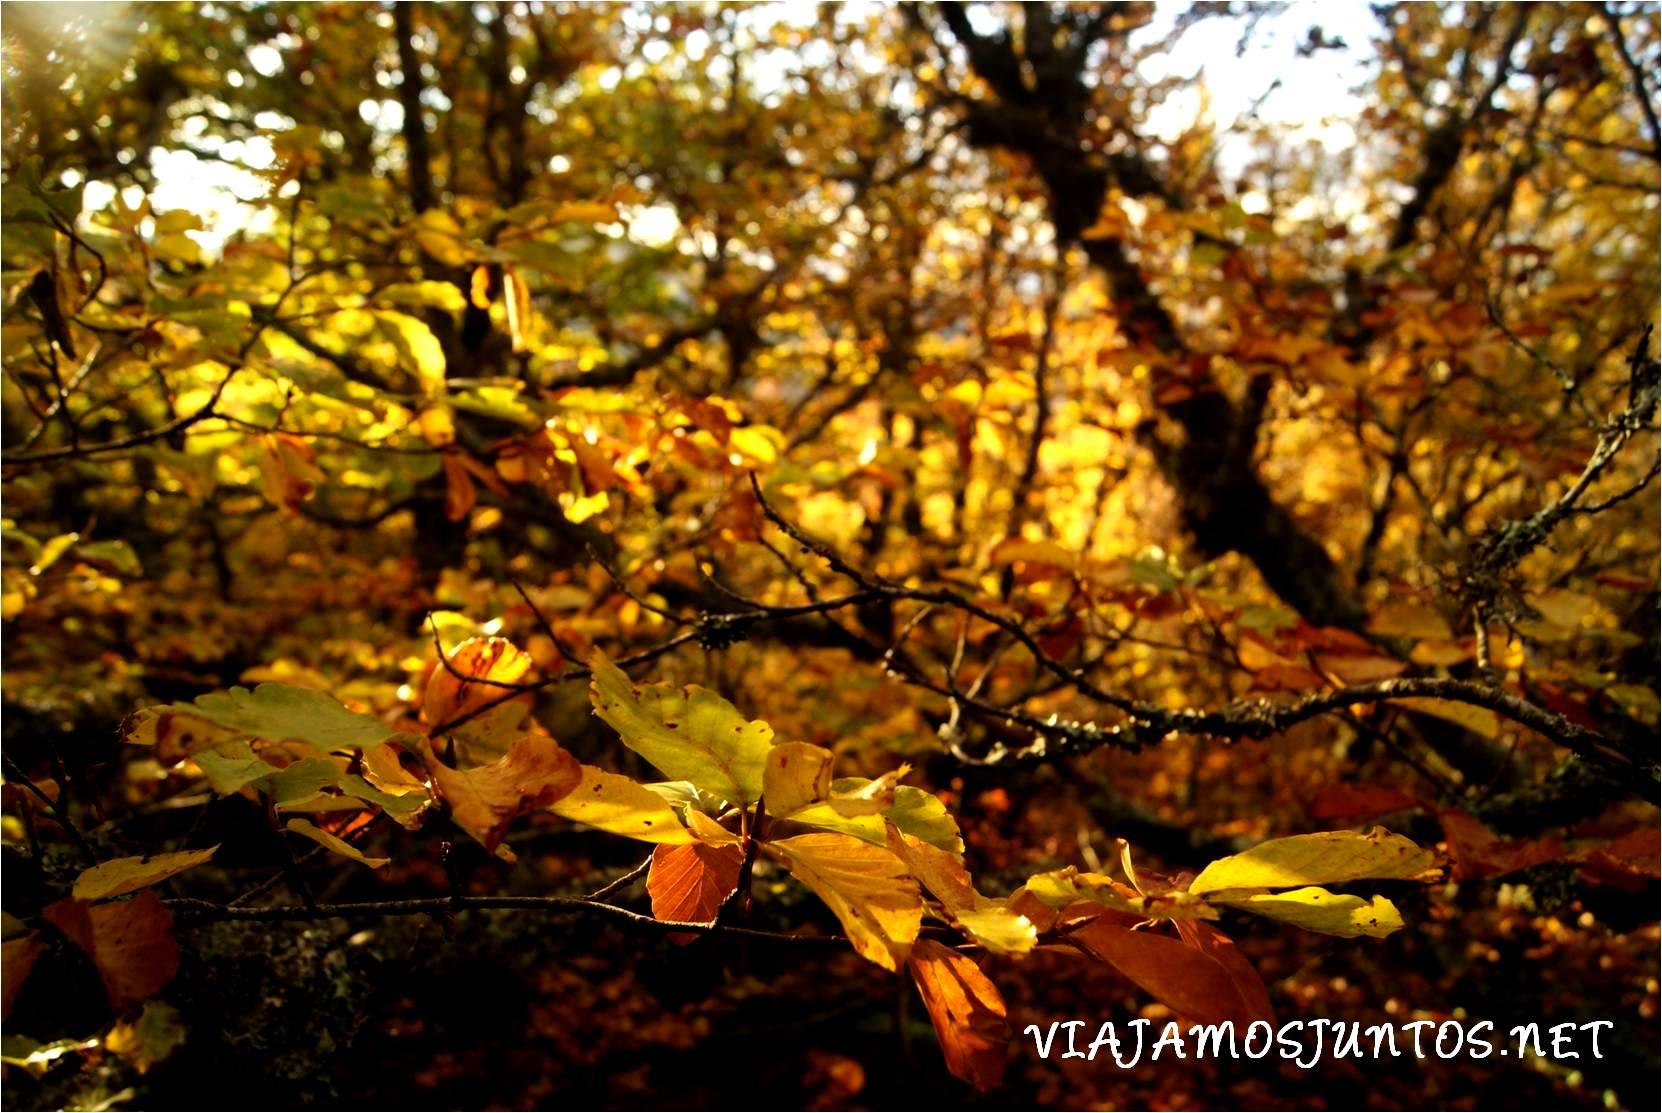 guadalajara, segovia, sistema central. rutas, ayllón, senderismo, monte, montaña, sierra, otoño, somosierra